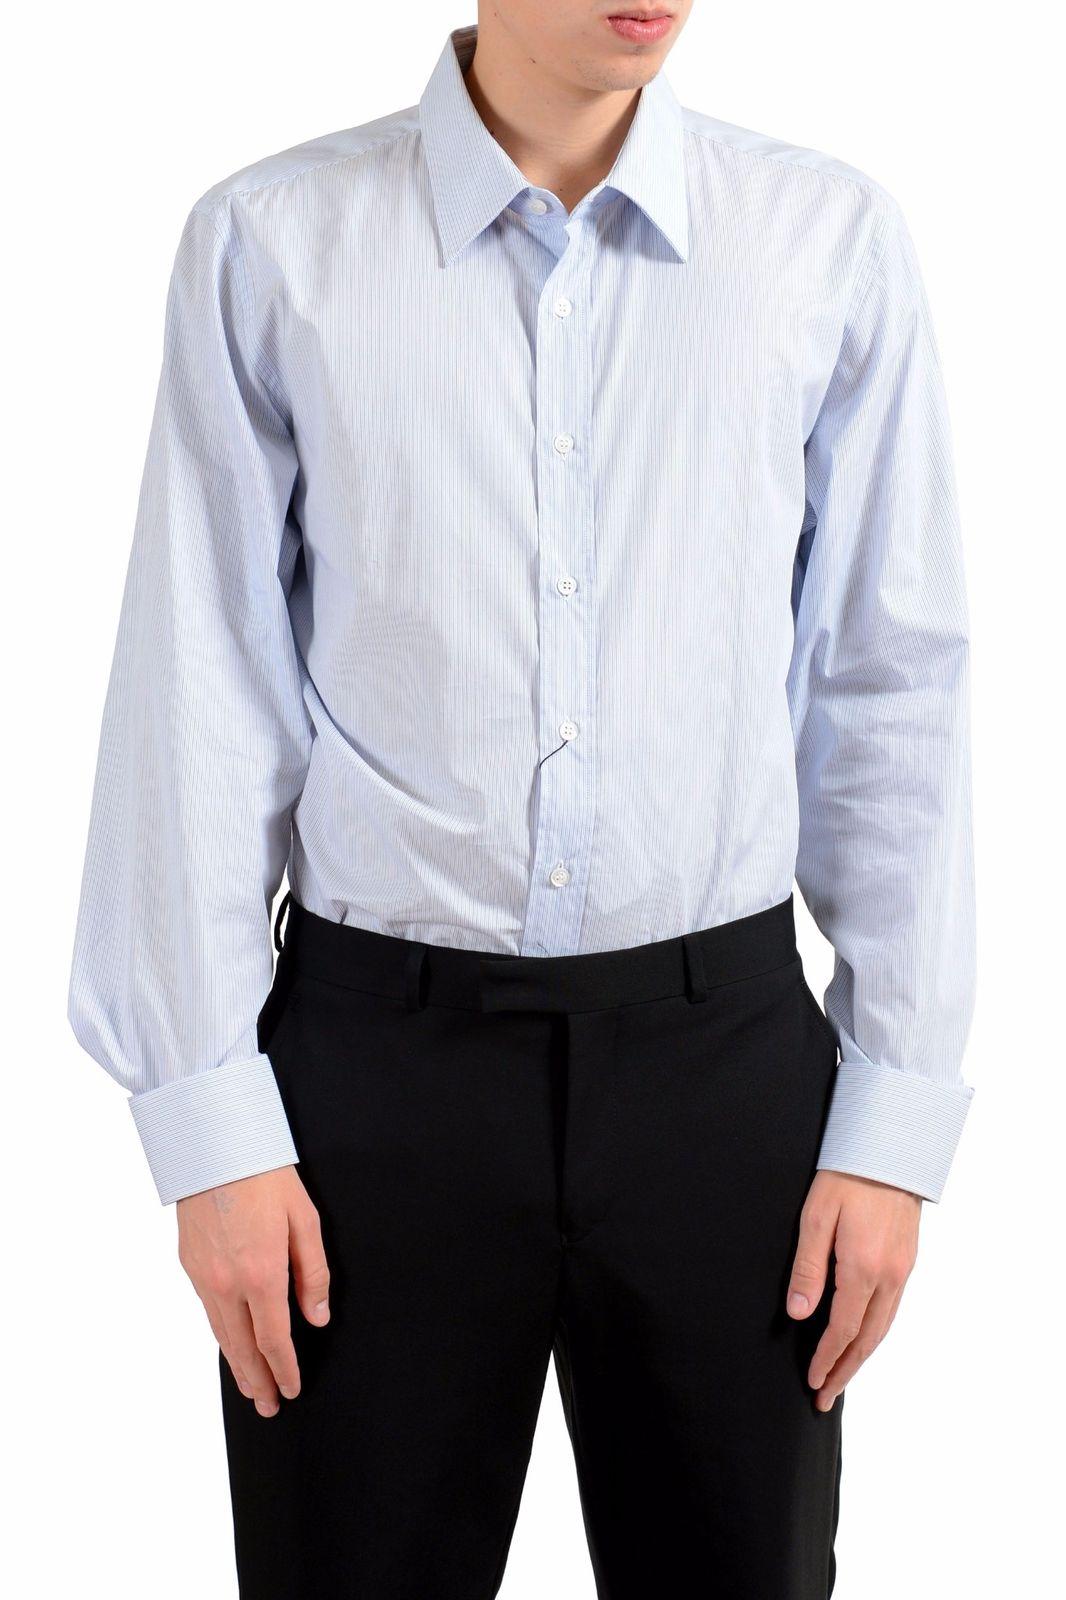 9f36bc3c4cab ONE MODA: Prada Men's Striped Long Sleeve Dress Shirt US 17.75 IT 45 ...